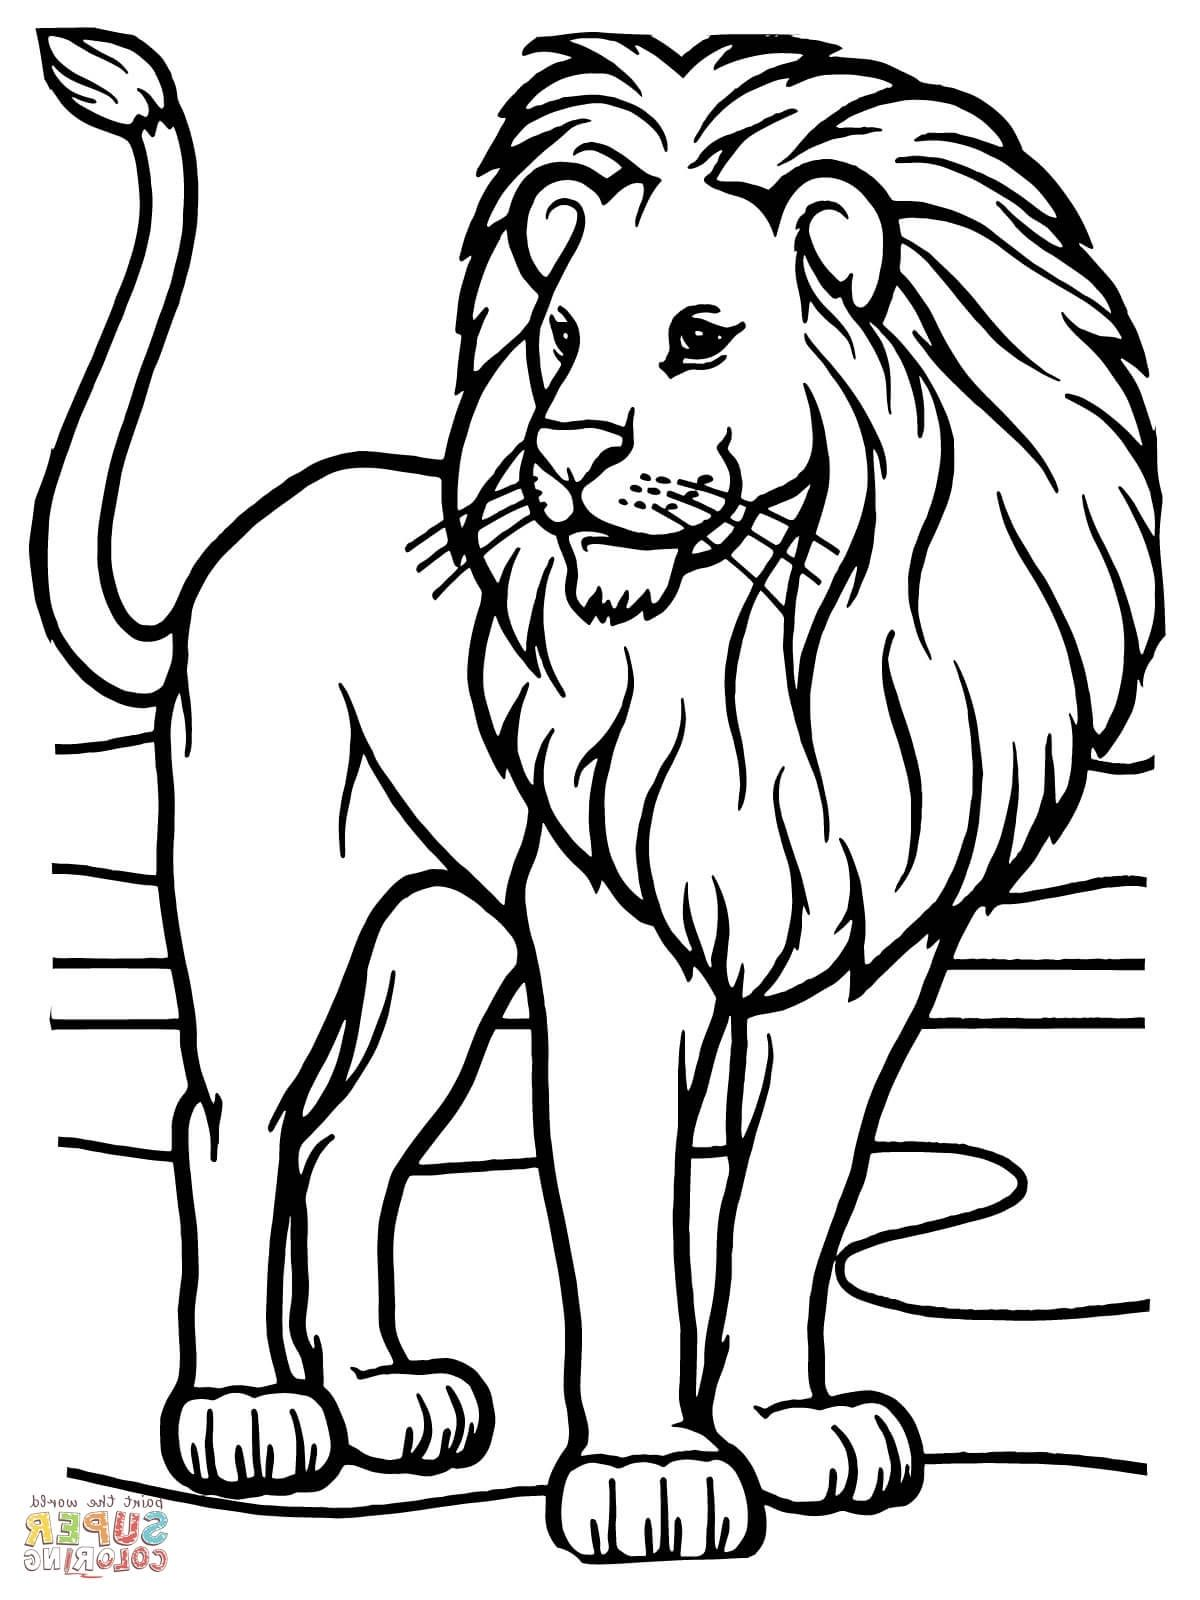 Coloring Page Lion Lion Coloring Pages Lion Coloring Page Lion Coloring